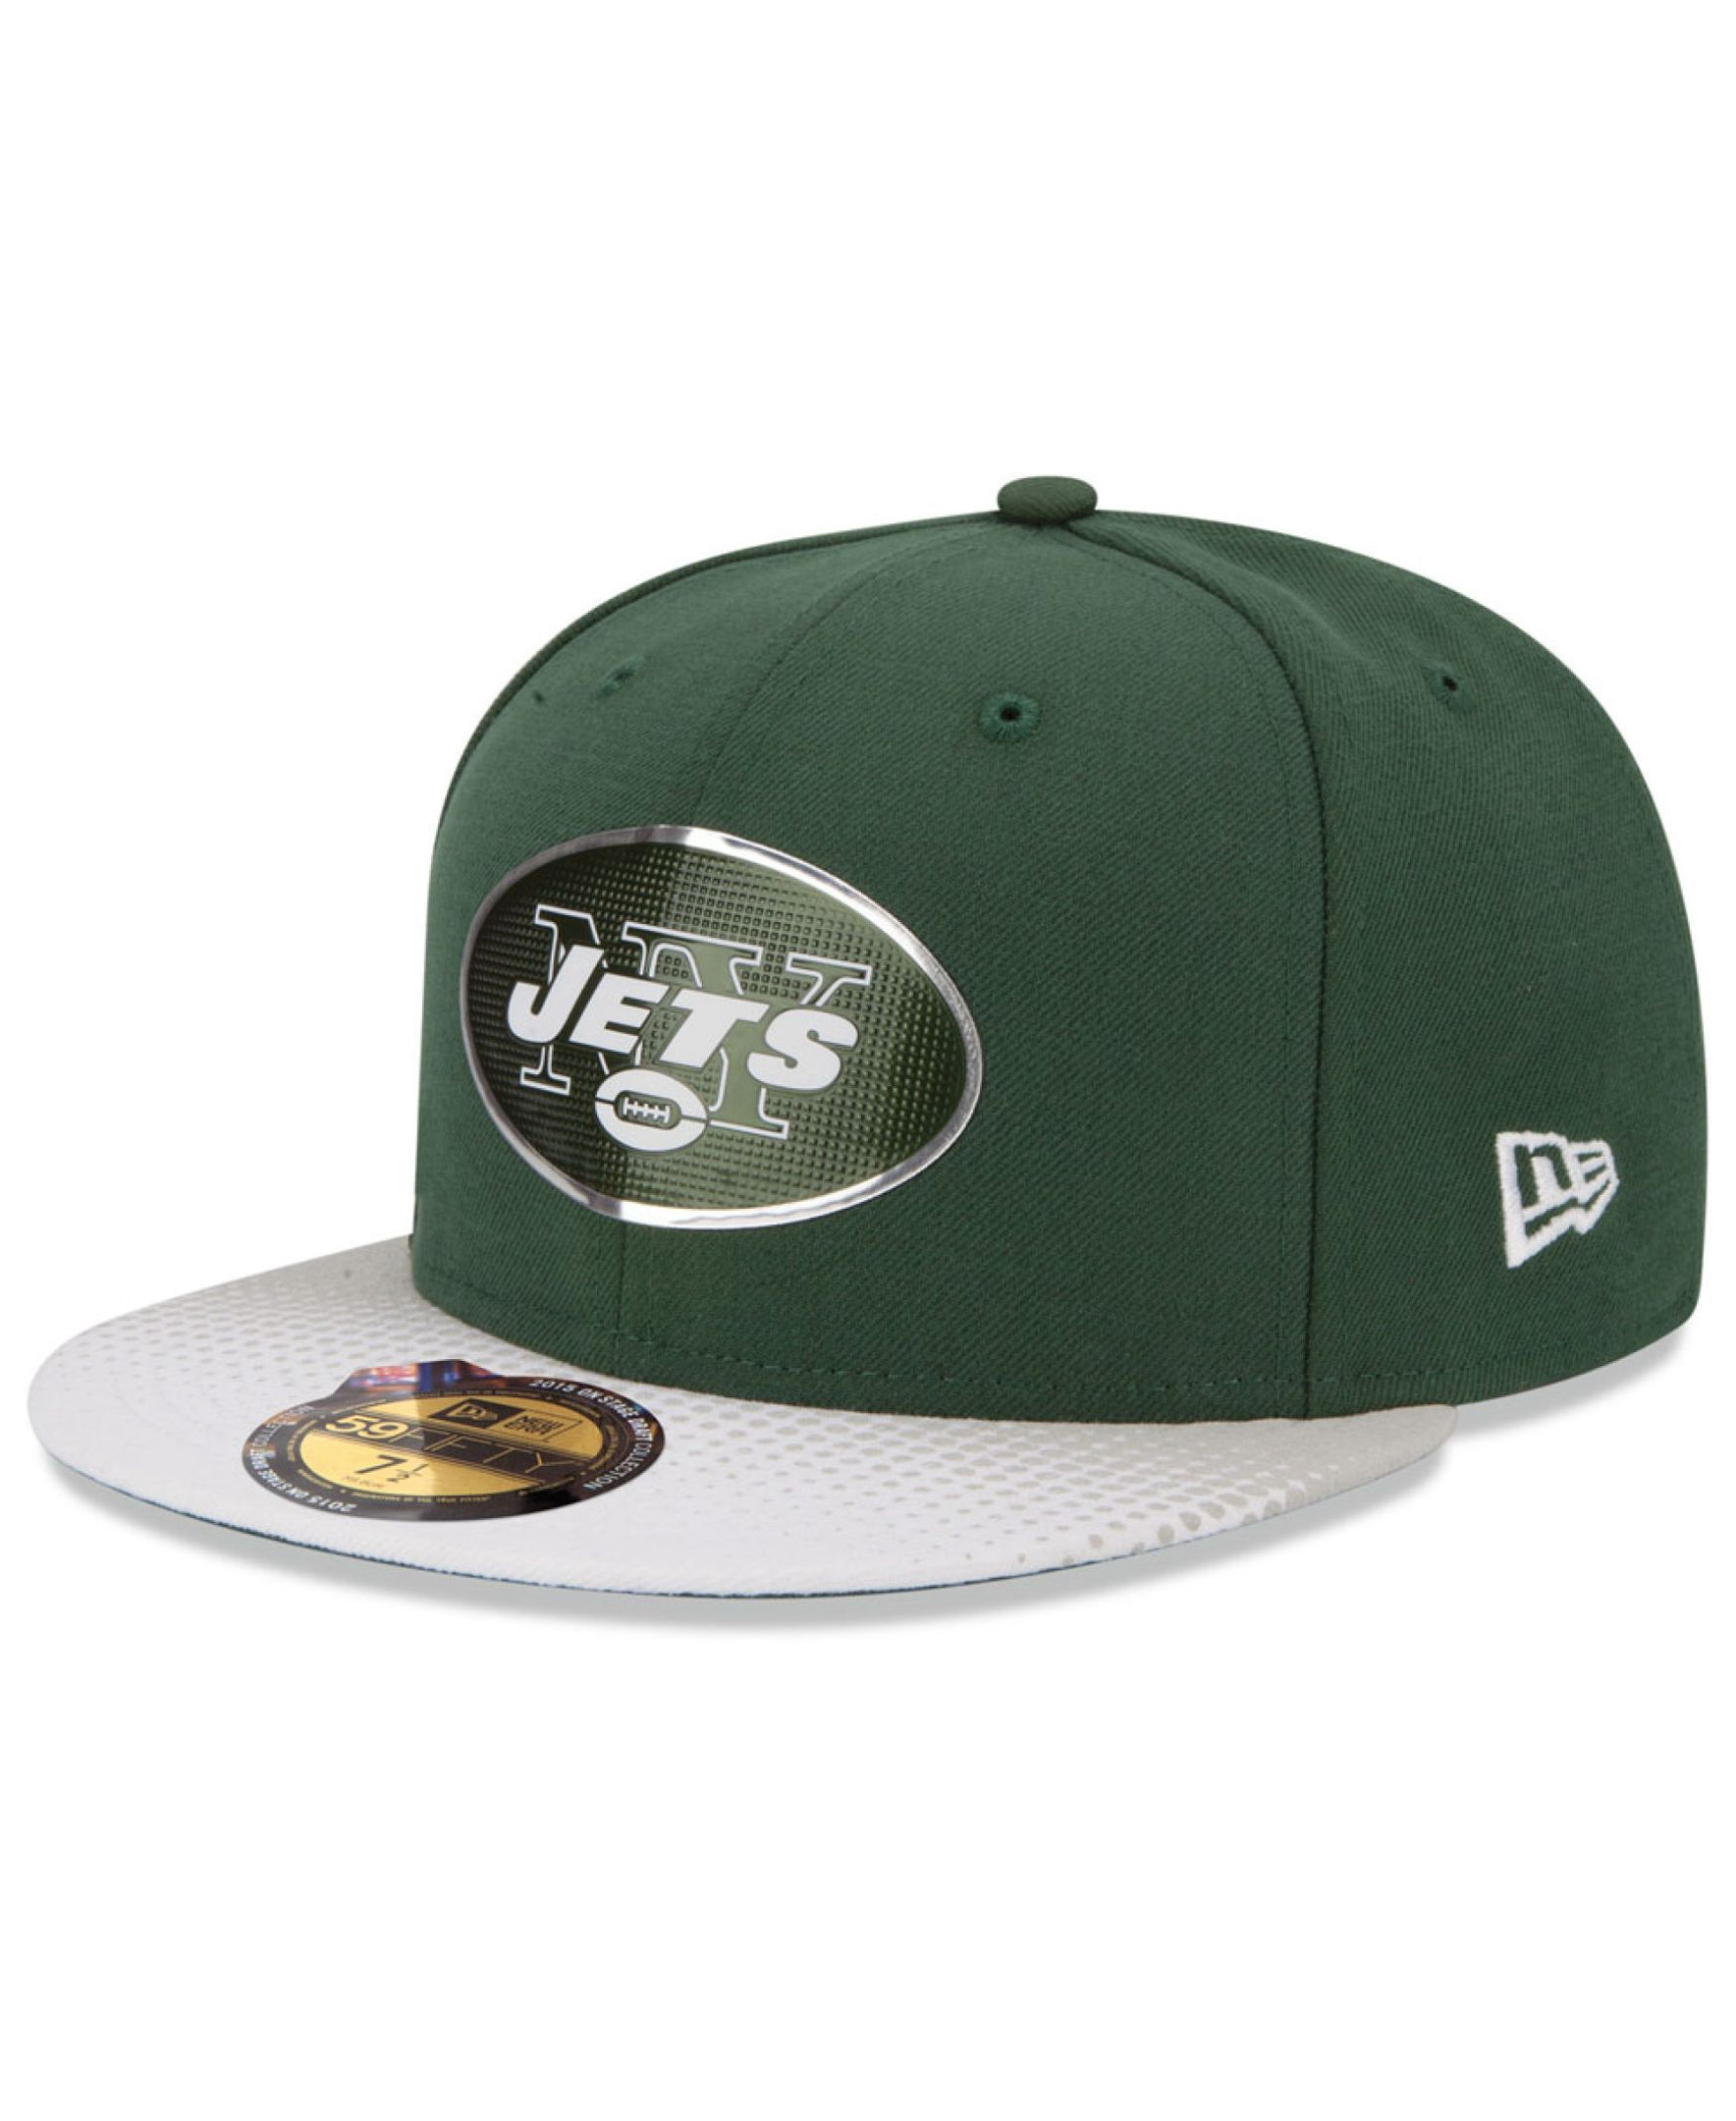 New Era Kids  New York Jets 2015 Nfl Draft 59FIFTY Cap  1e19e4e85